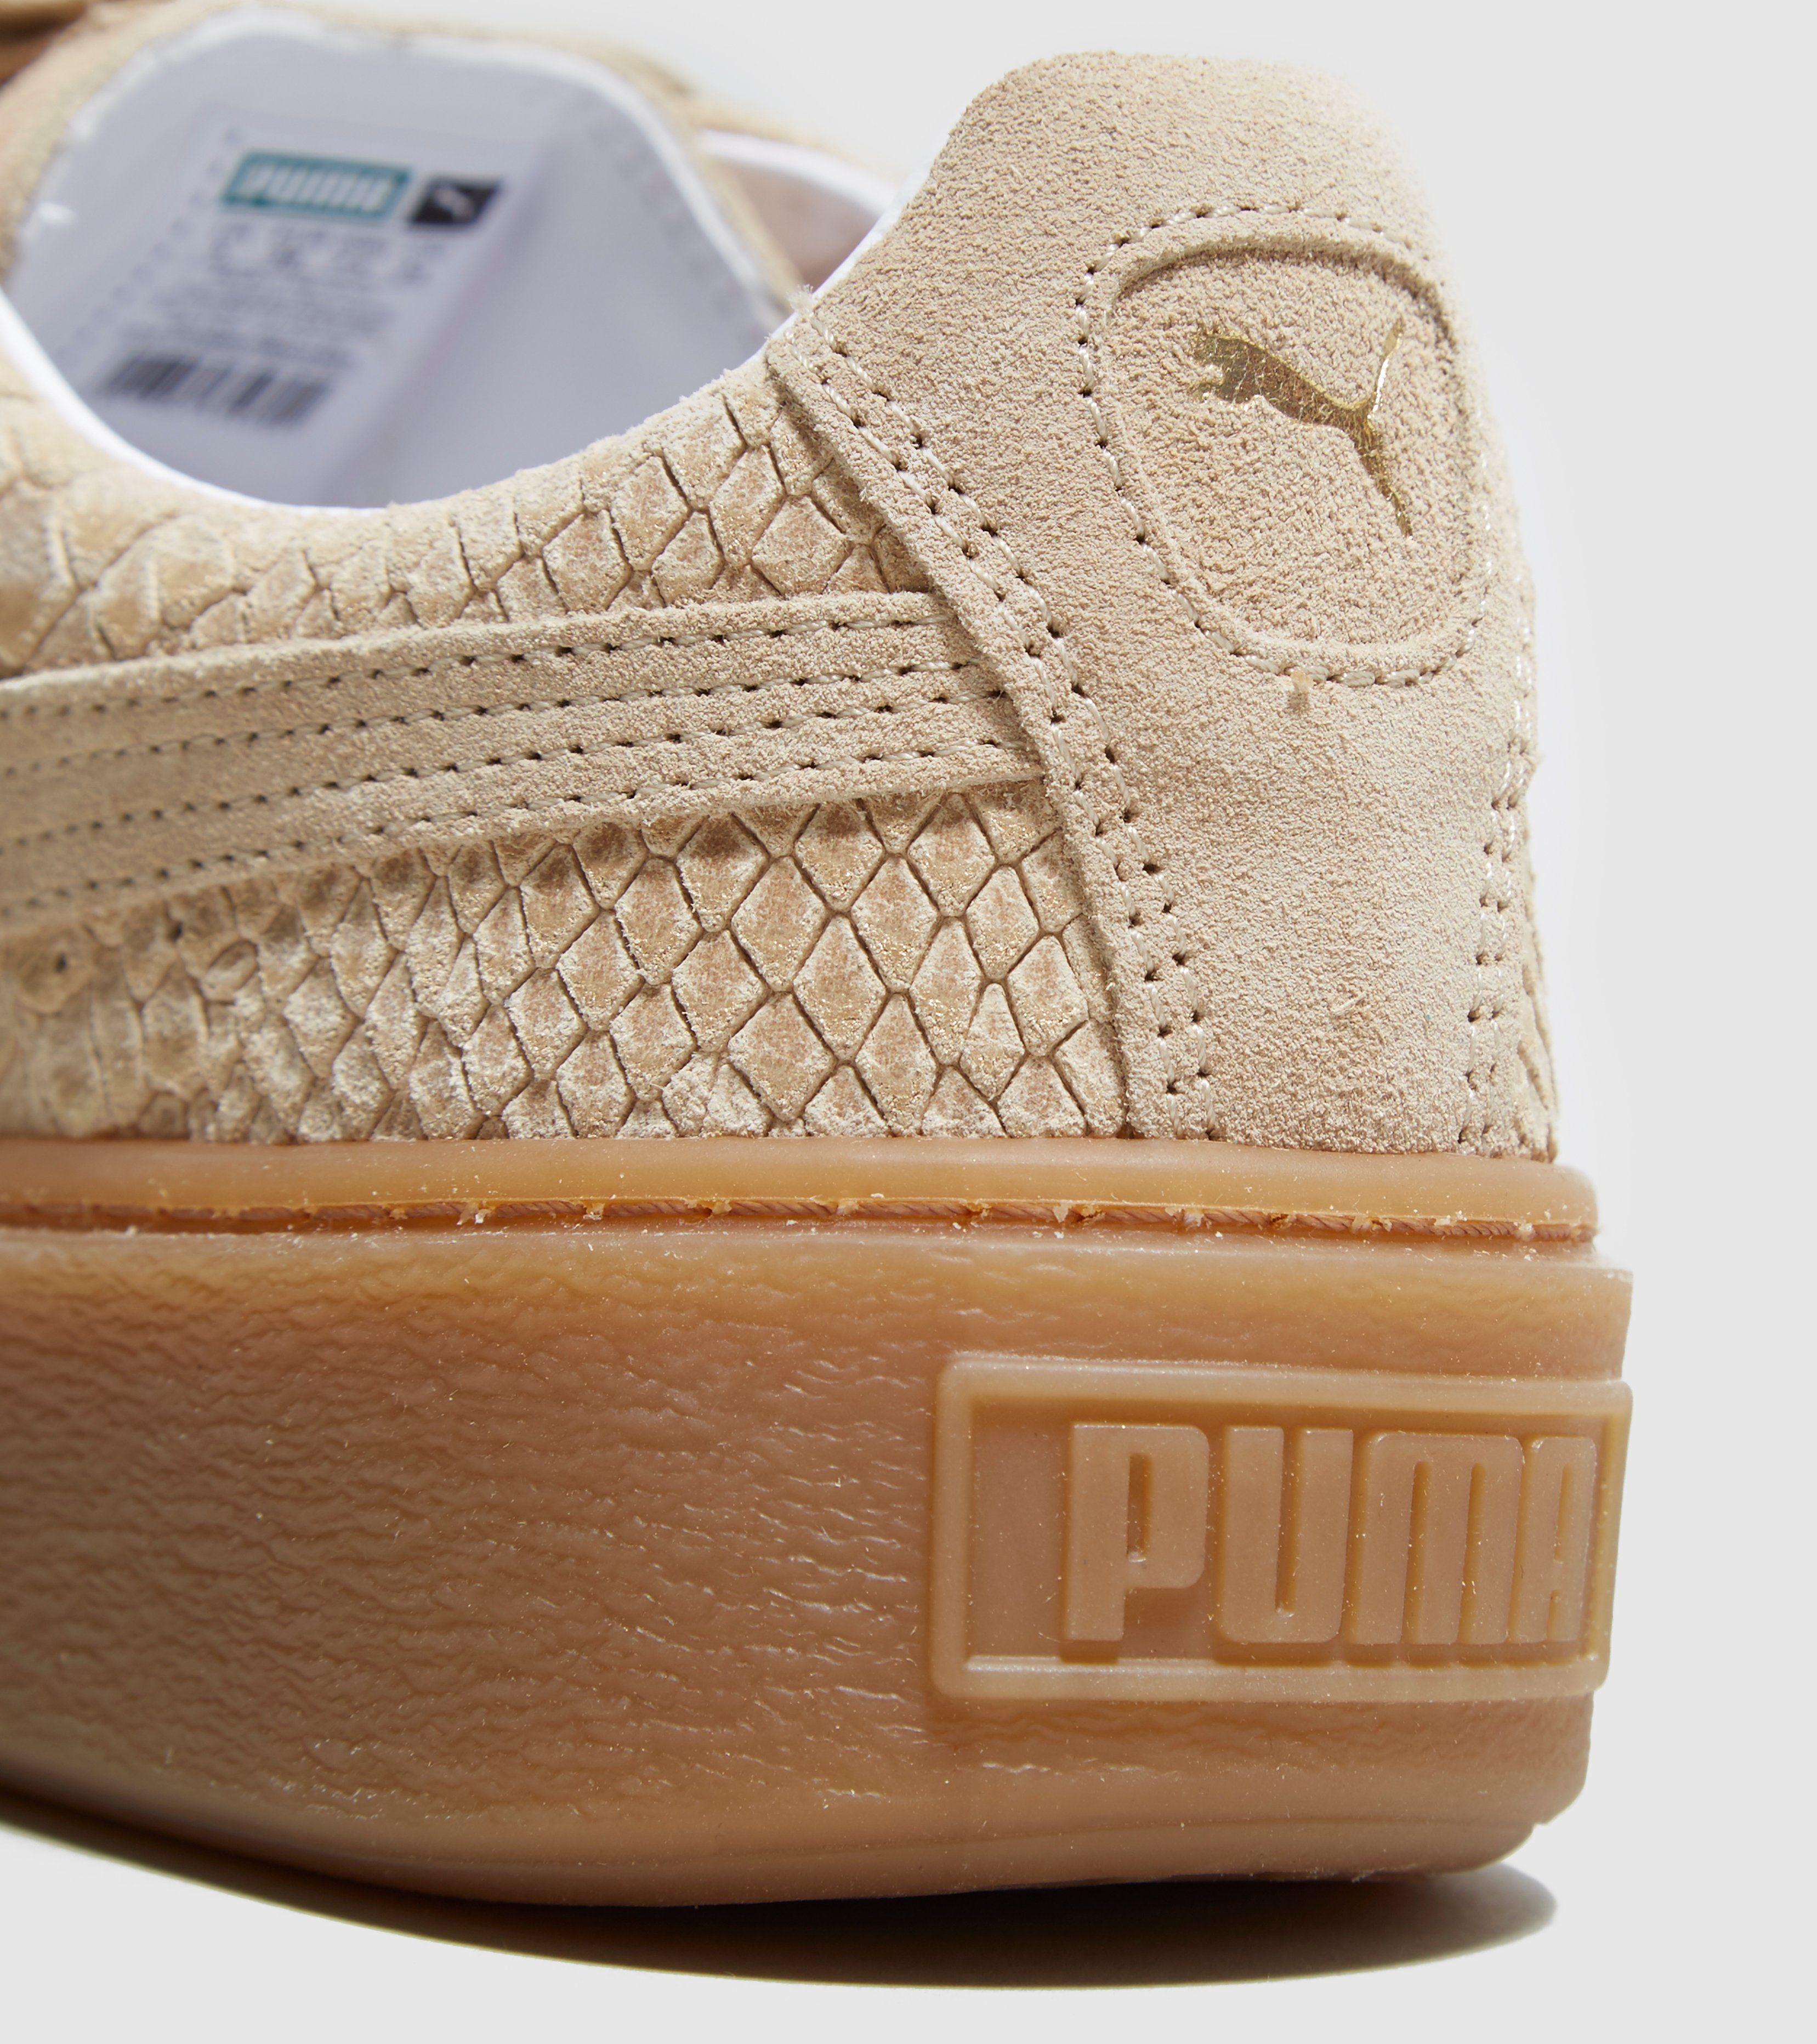 PUMA Platform Exotic Women's